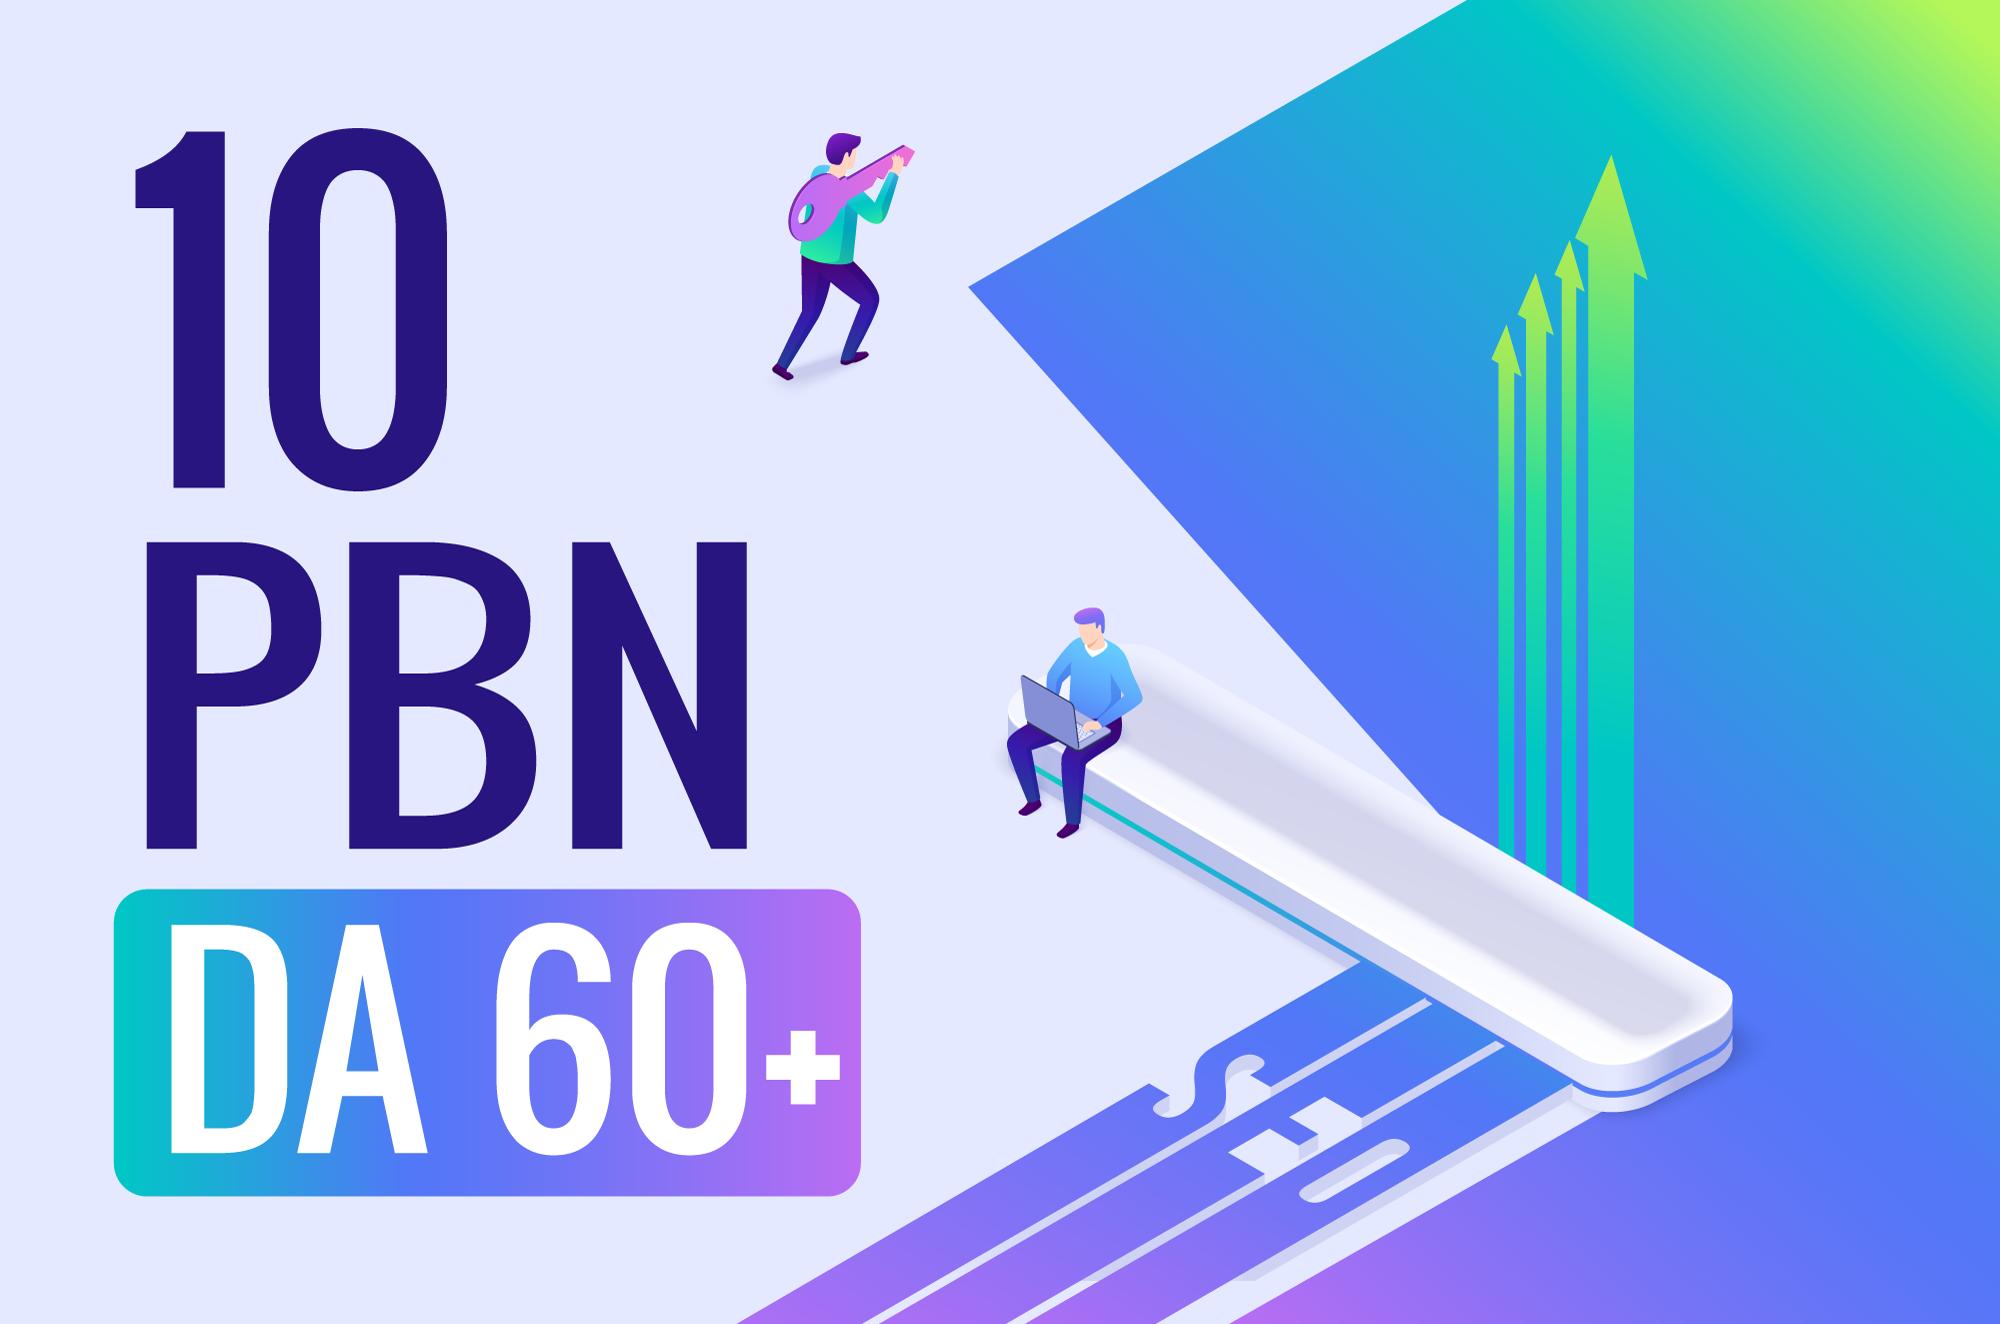 10 PBN backlinks with DA 60+ manually